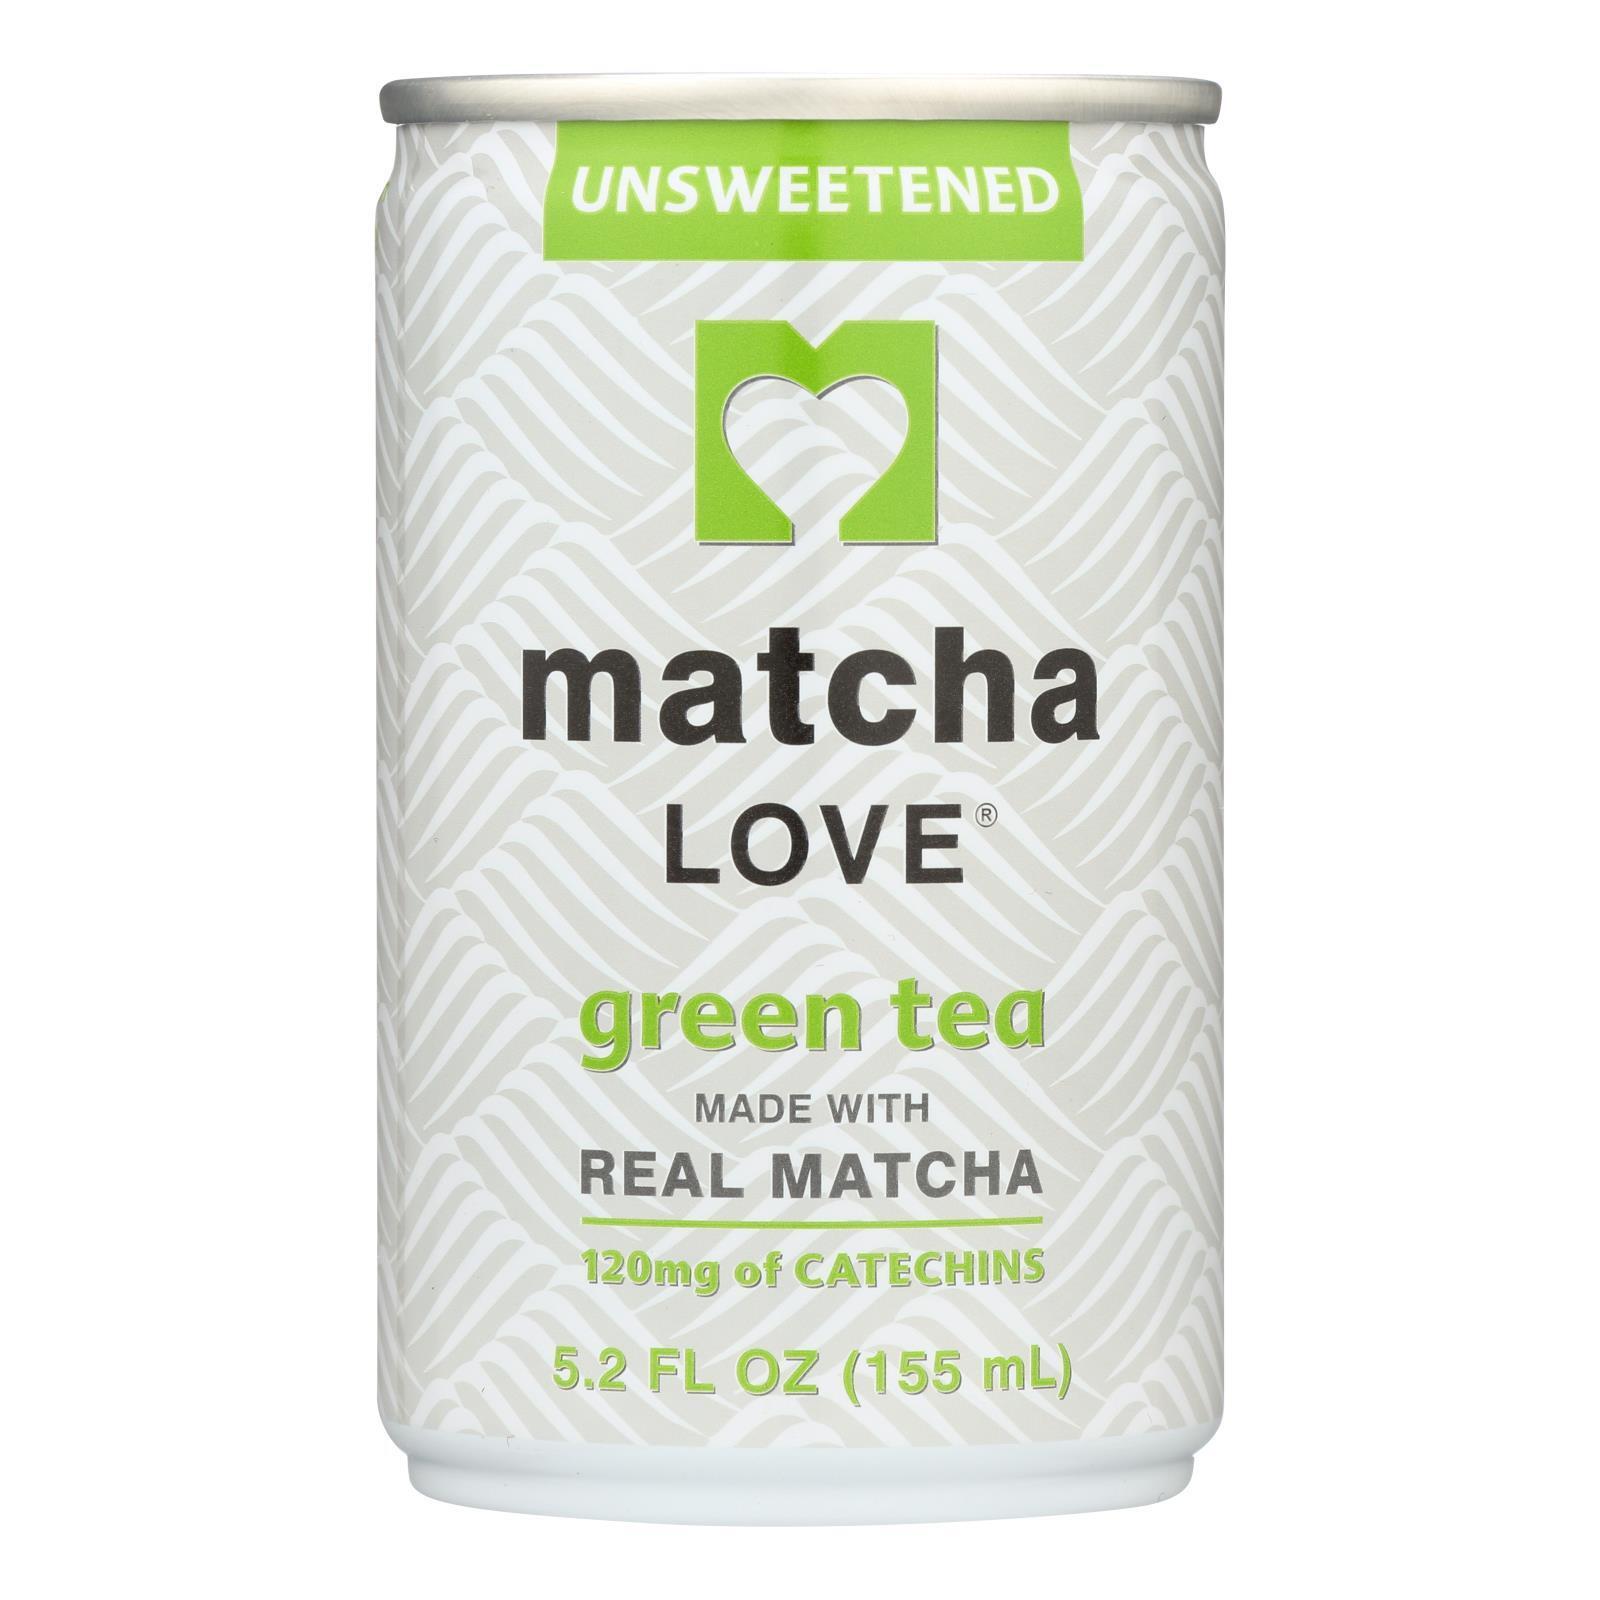 Matcha Love Unsweetened Tea - Case of 20 - 5.2 oz.